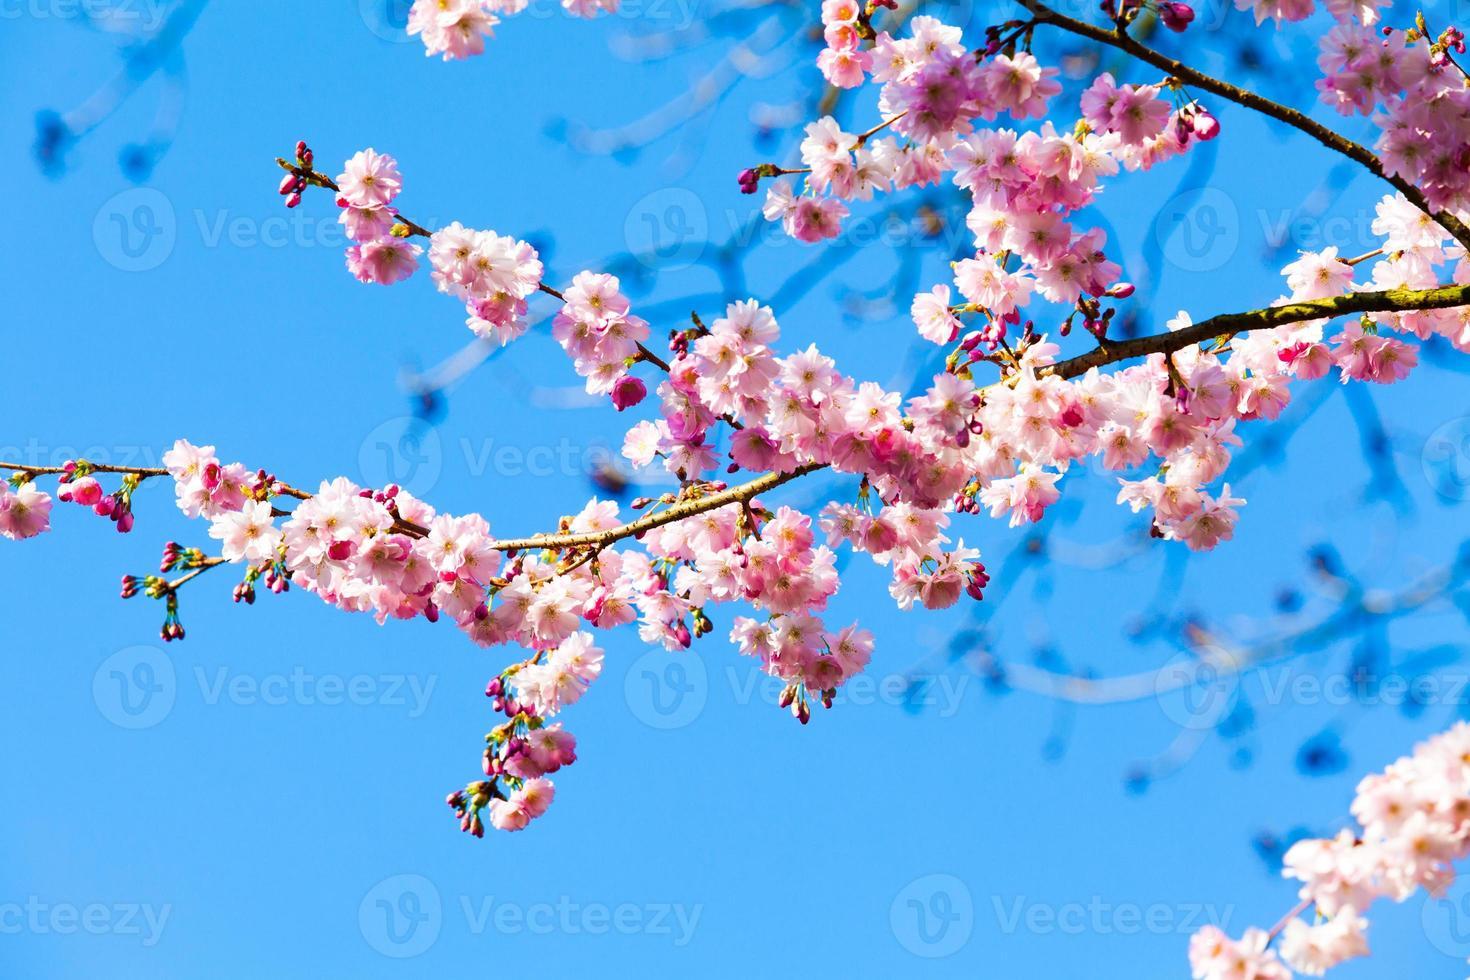 sakura bloemen bloeien. mooie roze kersenbloesem foto